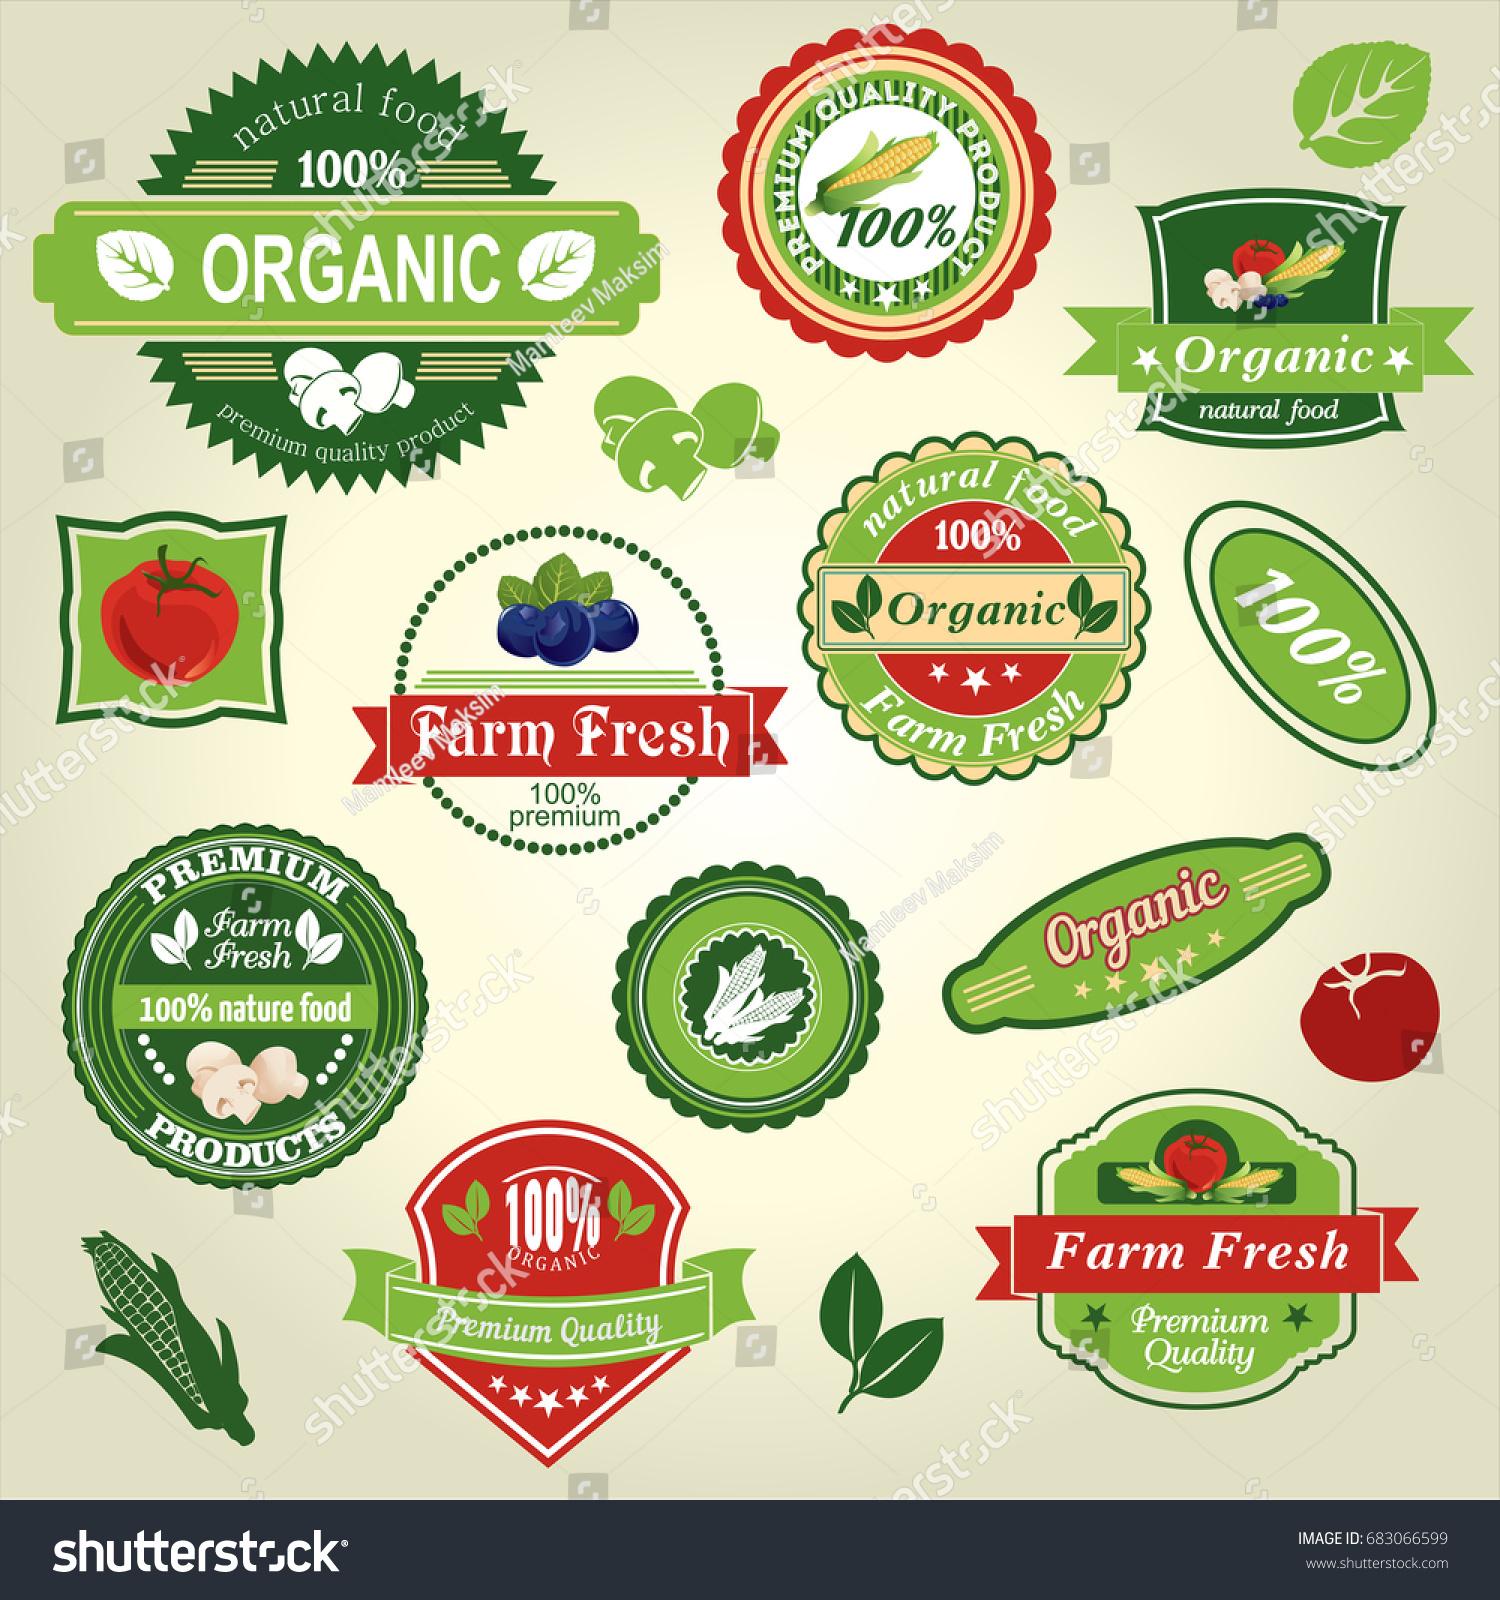 Organic food farm fresh natural product stock vector royalty free